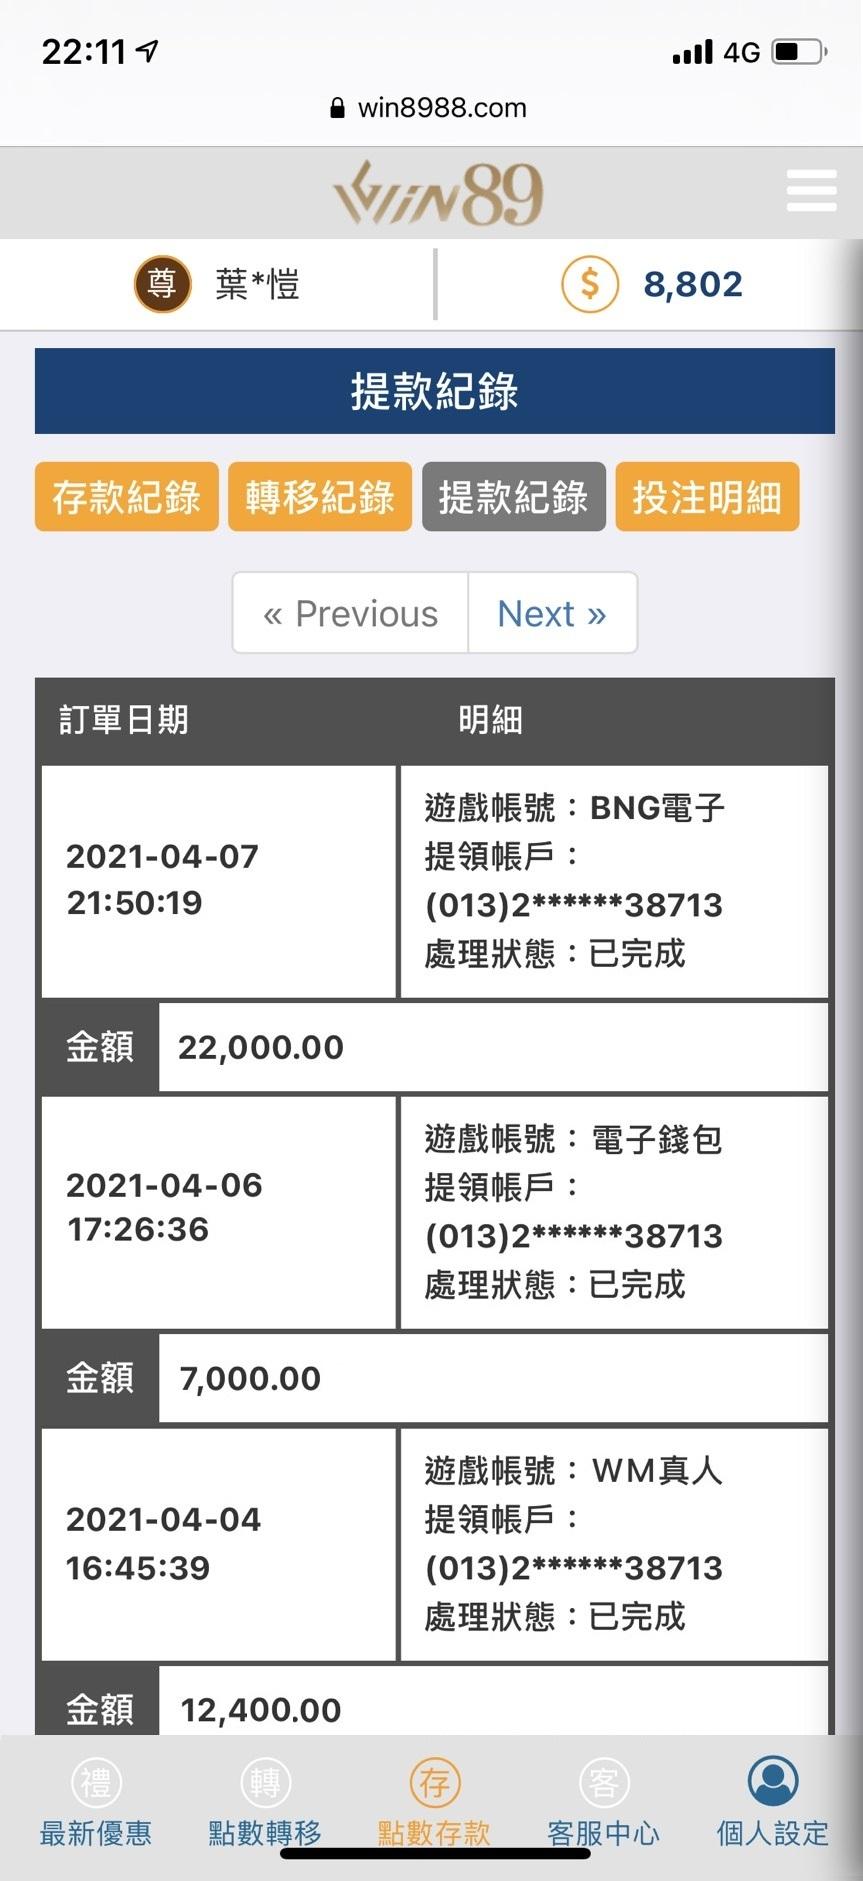 HOYA娛樂城-這間會出金嗎 ? WIN89娛樂城